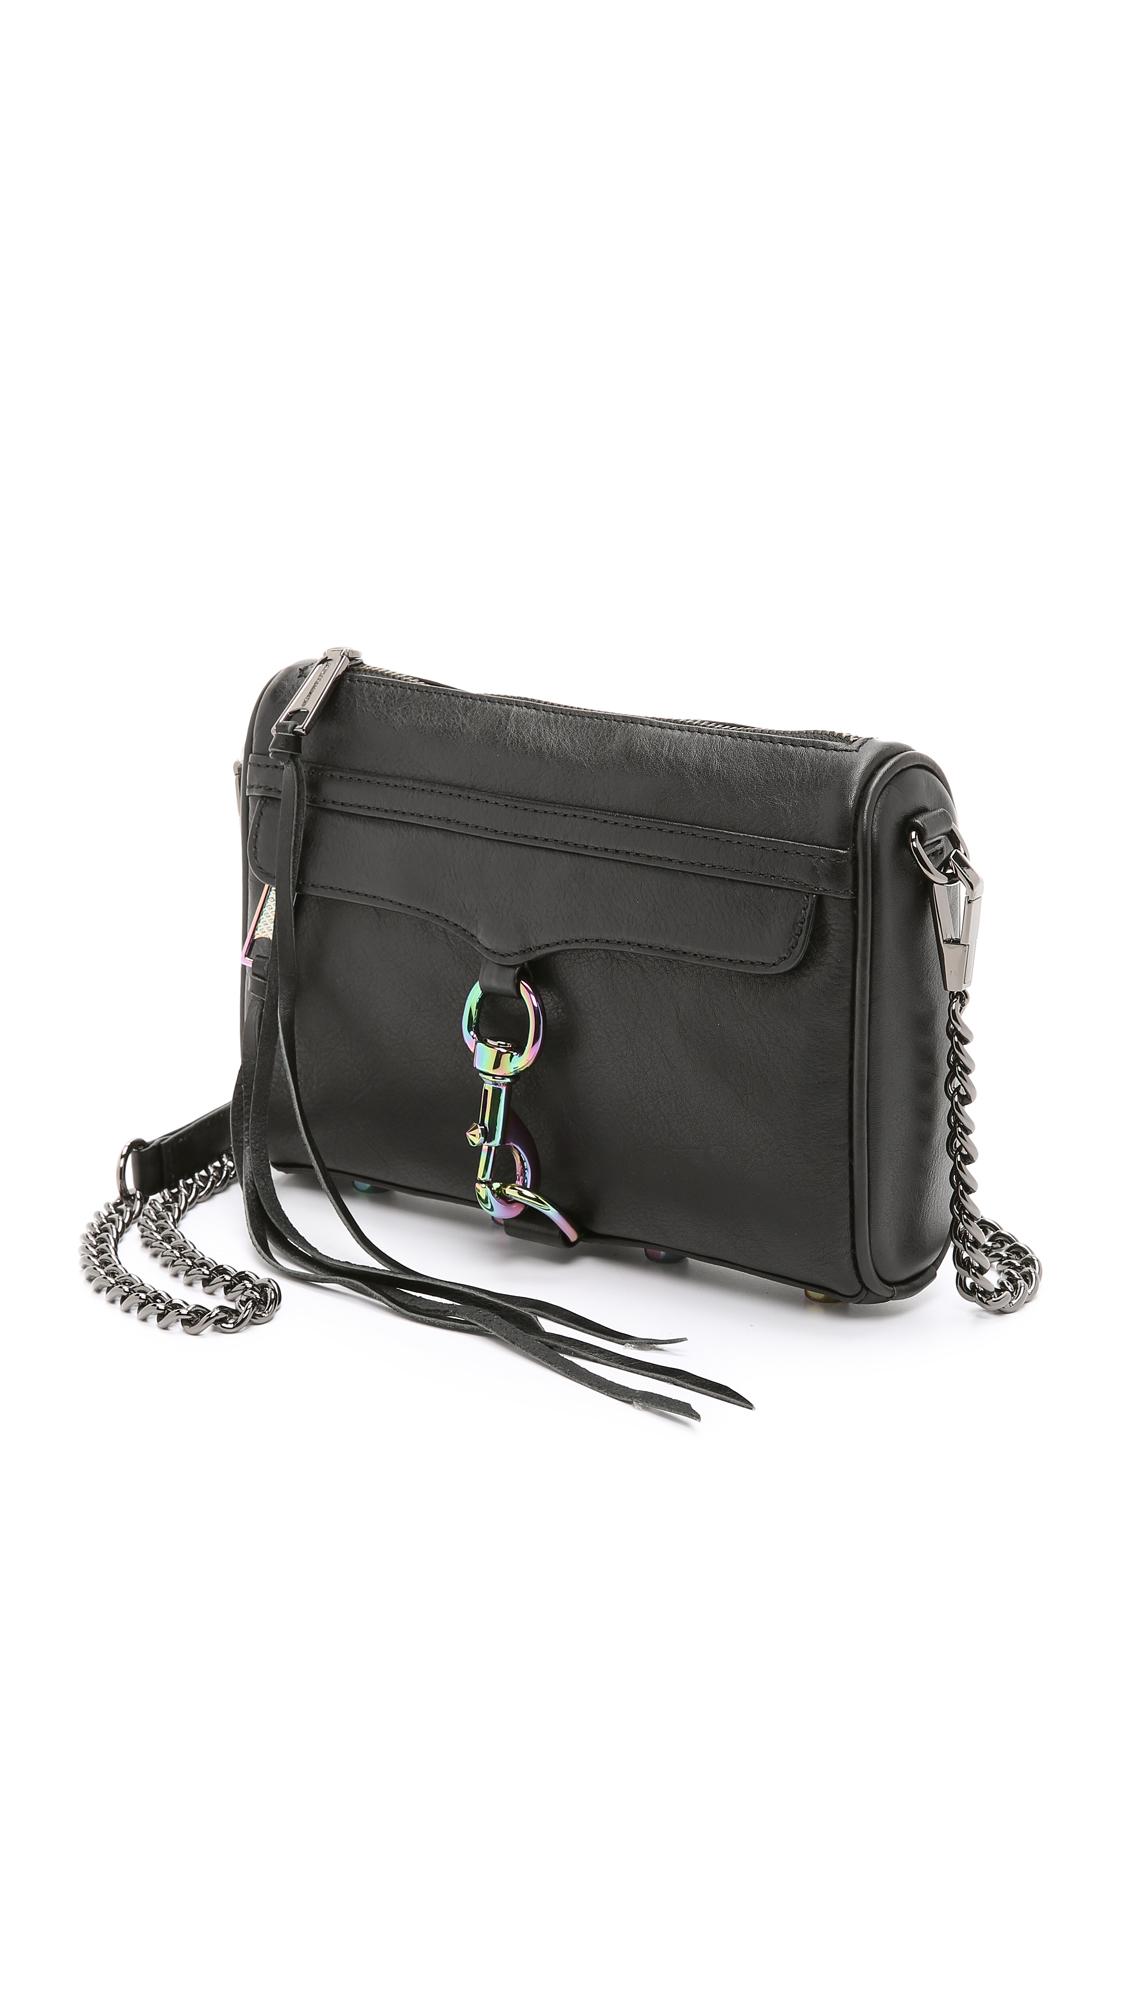 Rebecca minkoff 'm.a.c.' Mini Leather Crossbody Bag in ...